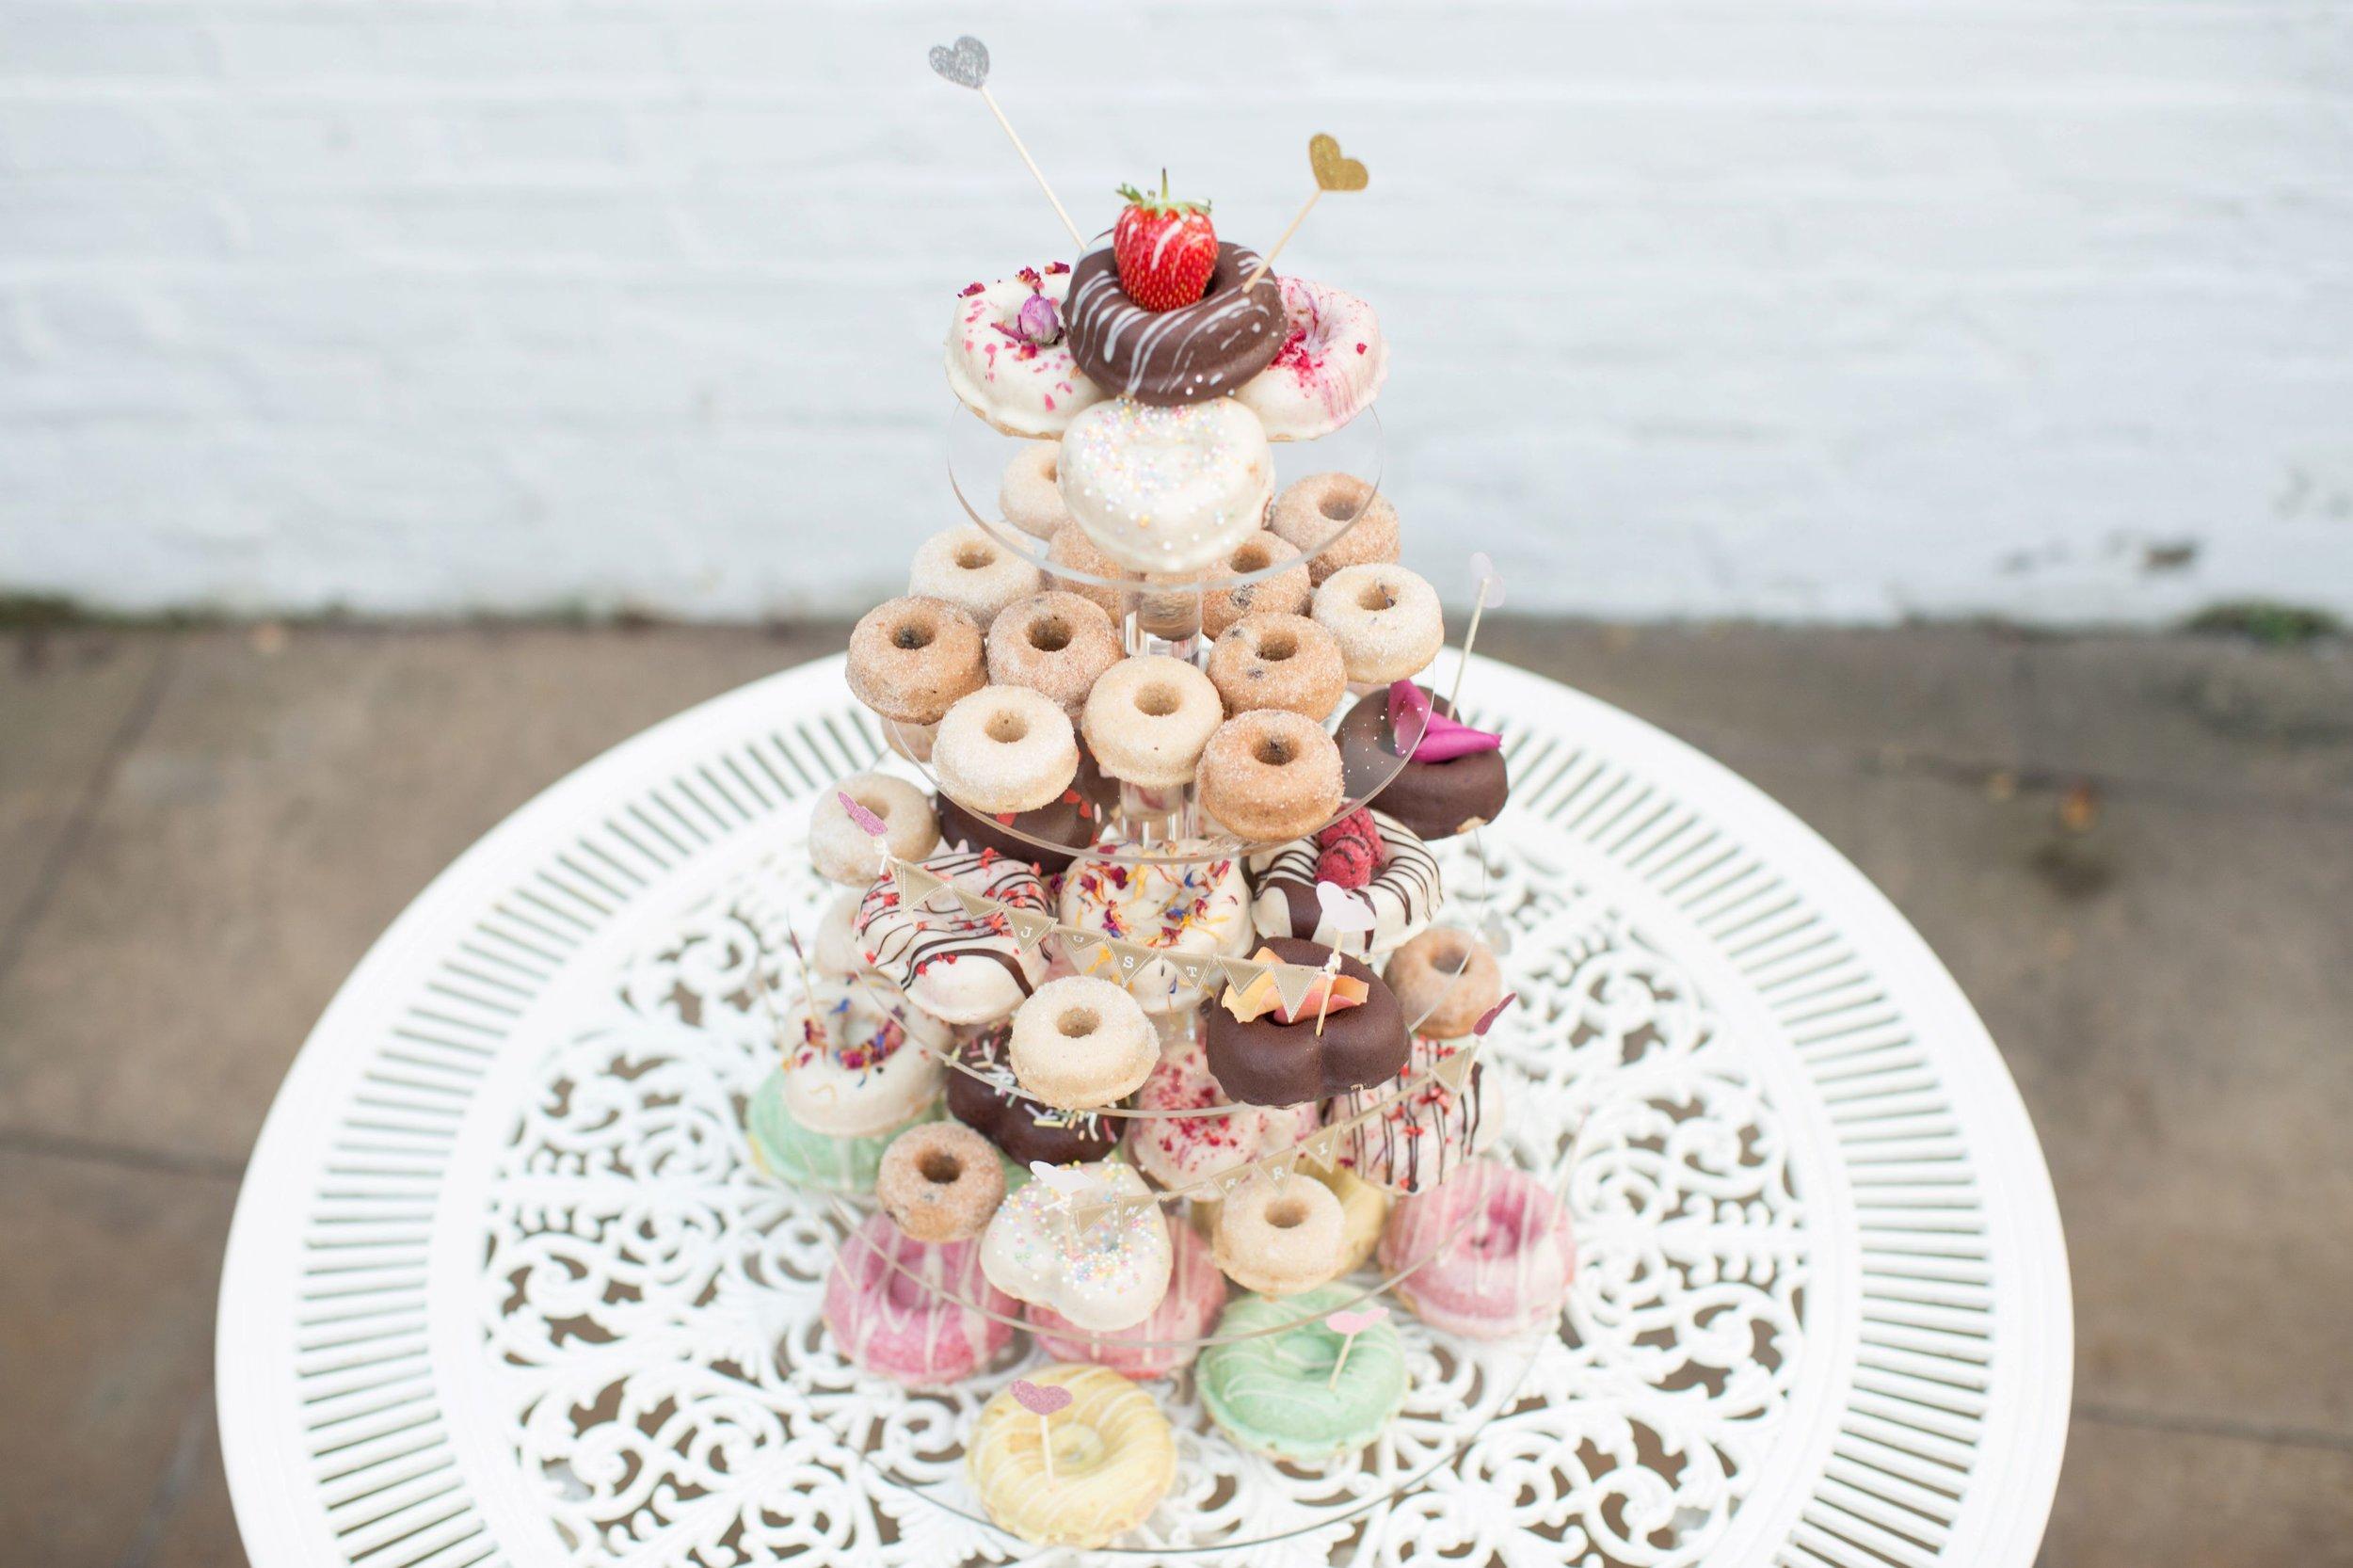 Hulya_&_Ben's_Clifton_Nurseries_London_Wedding_1033.jpg